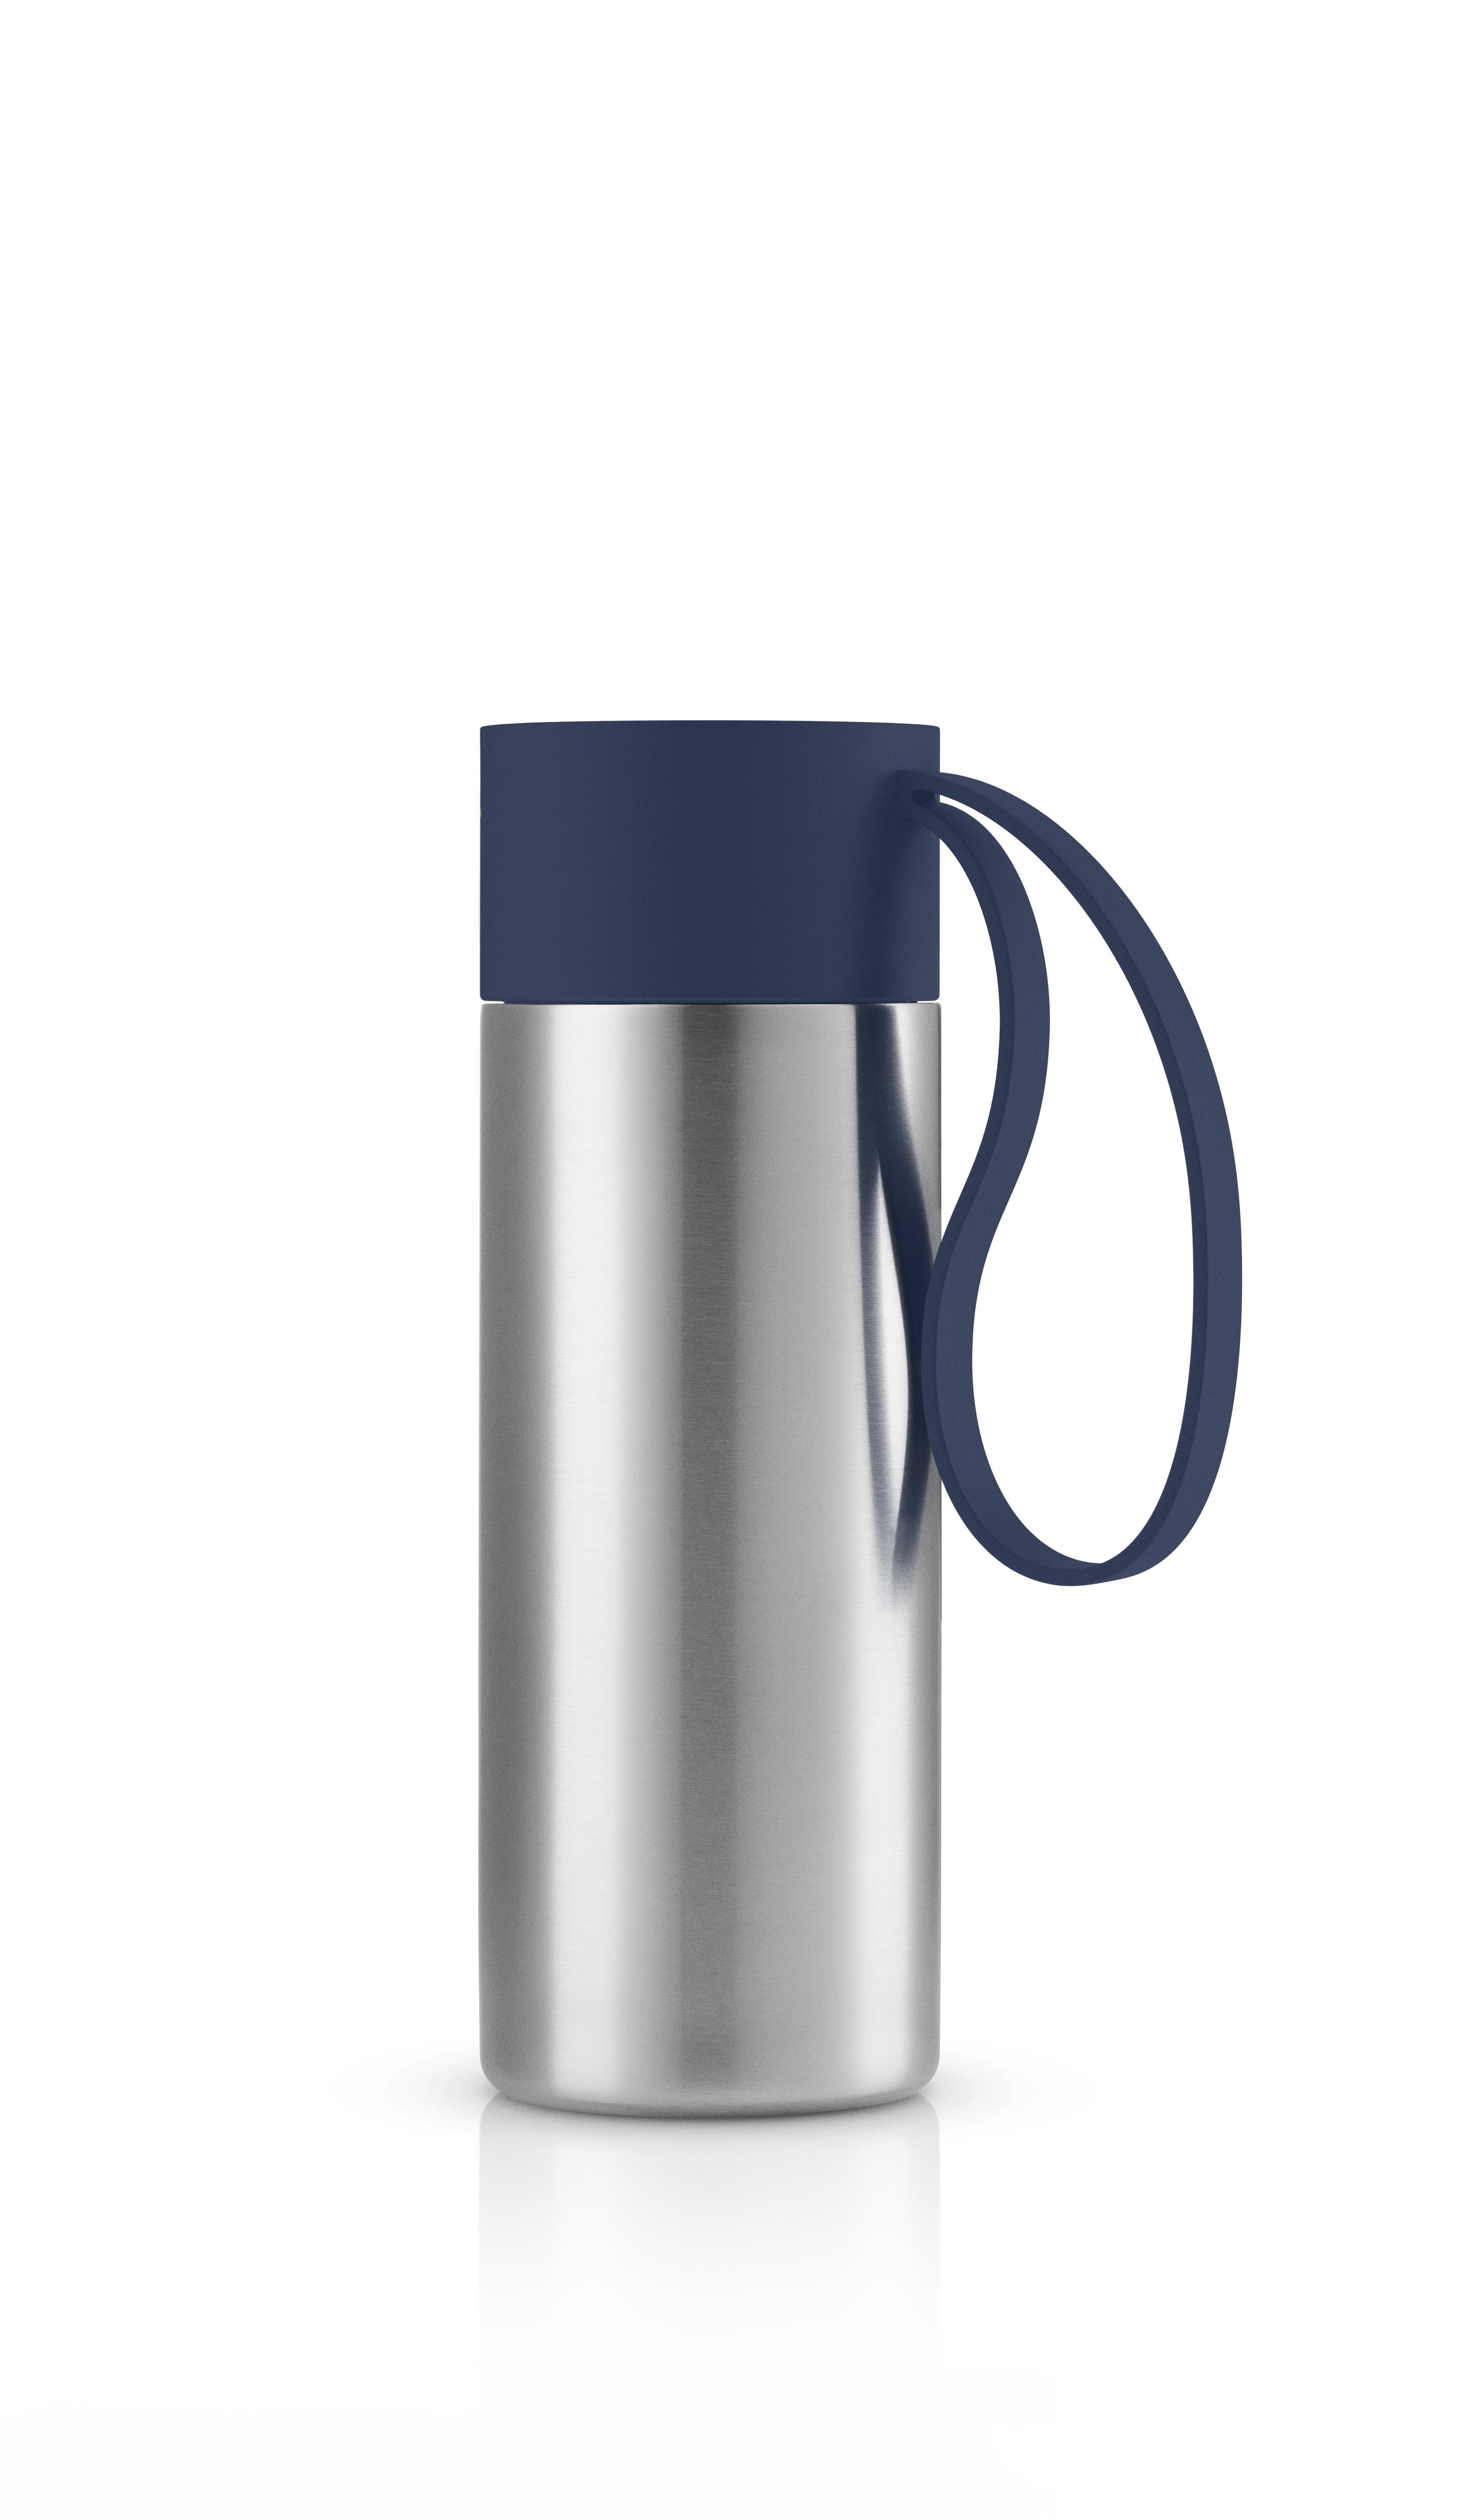 Eva Solo - To Go Cup - Navy Blue (567455)